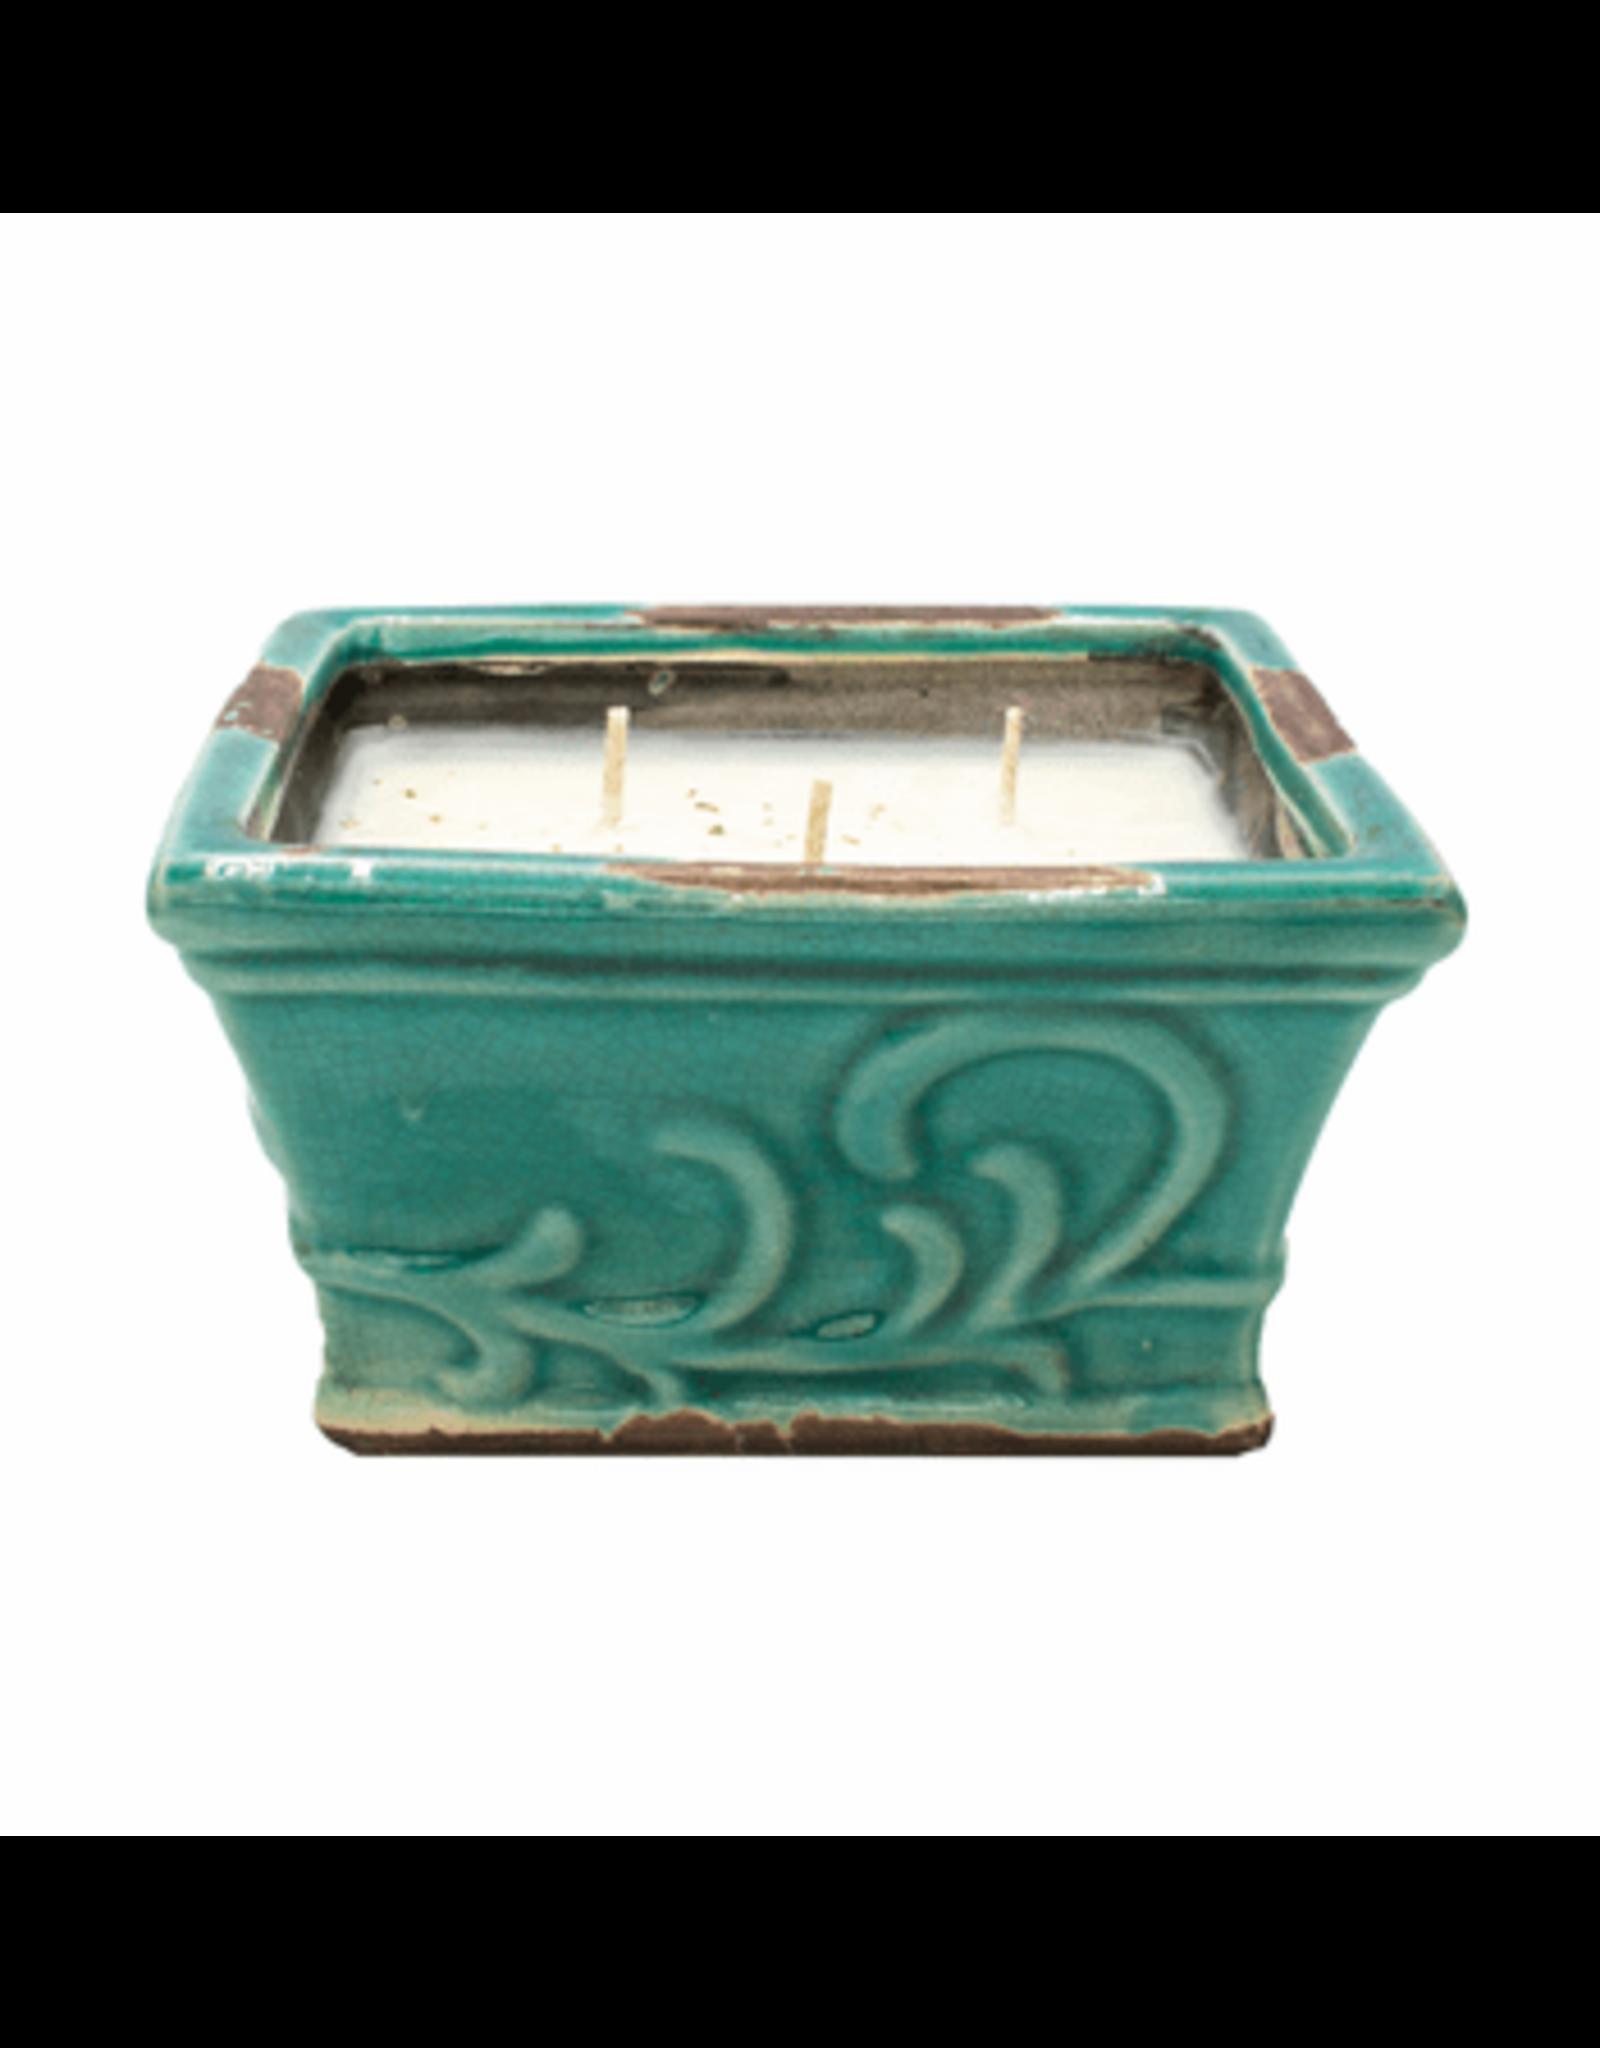 Swan Creek Candle, English Garden, Lg Sq 16oz Southern Sweet Tea